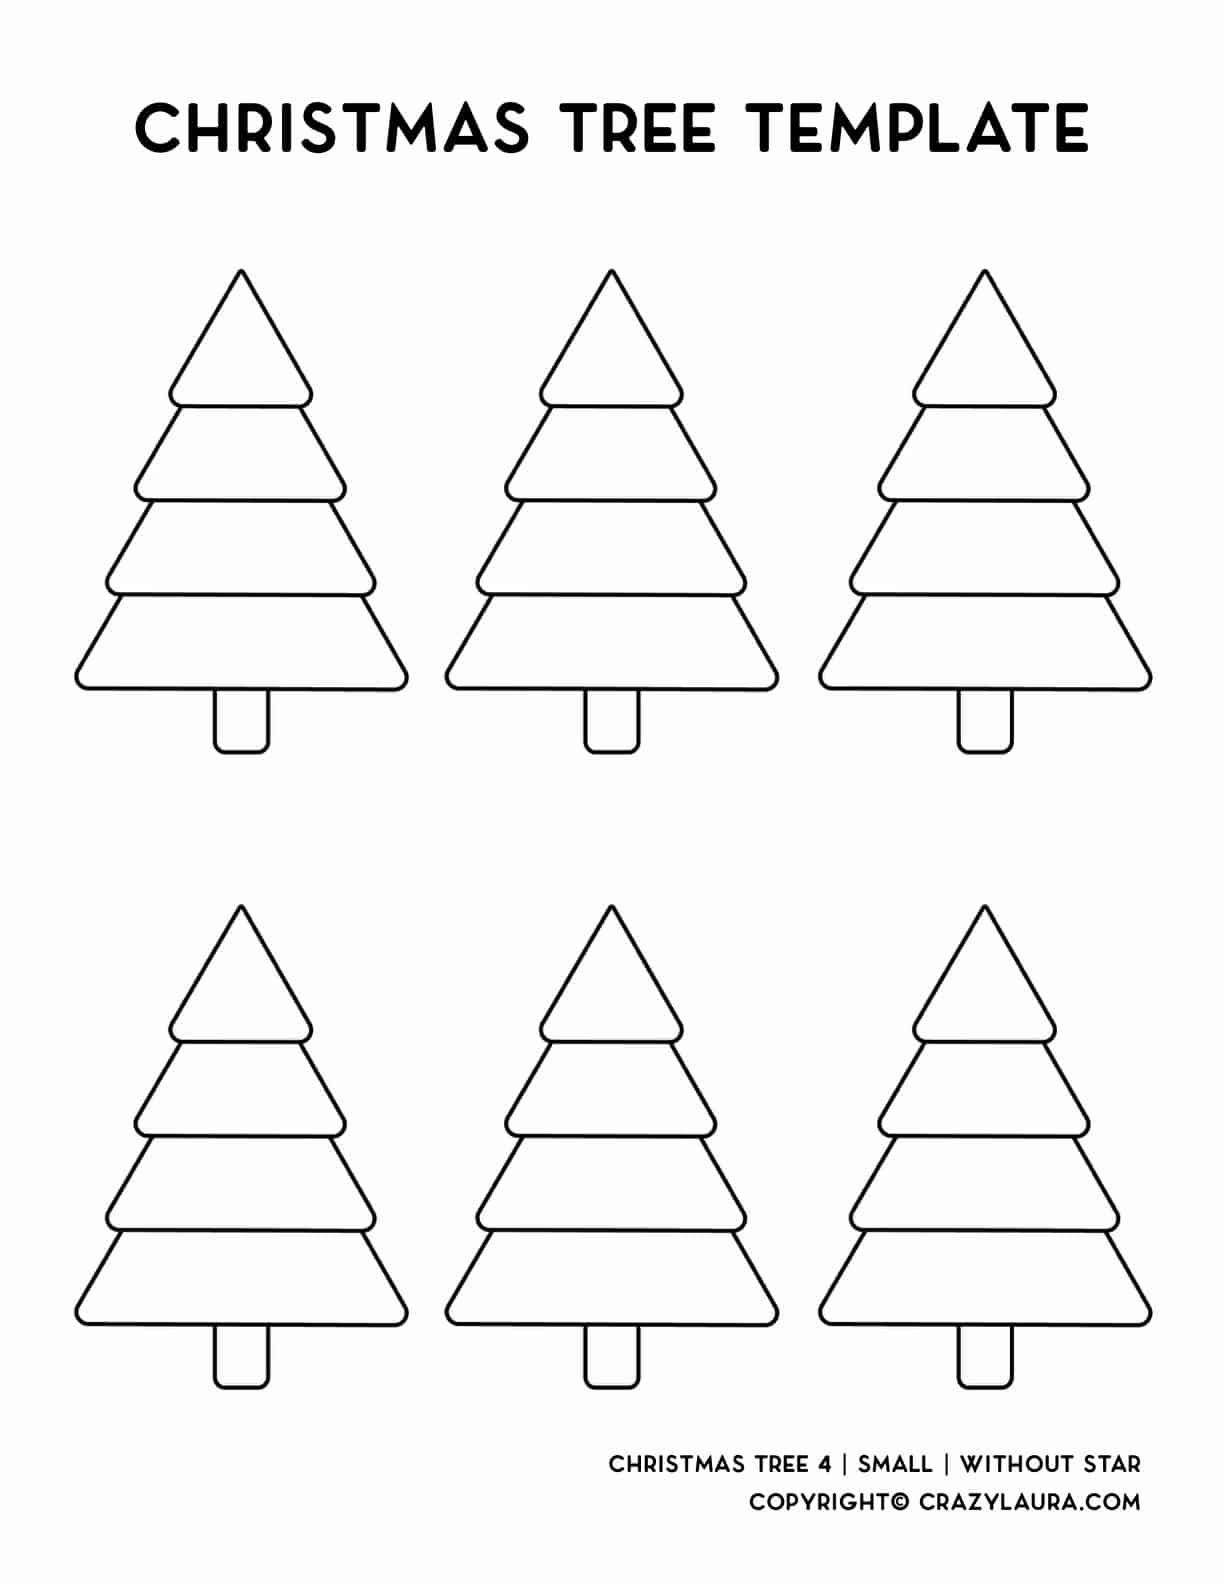 easy printable pdf for holiday tree